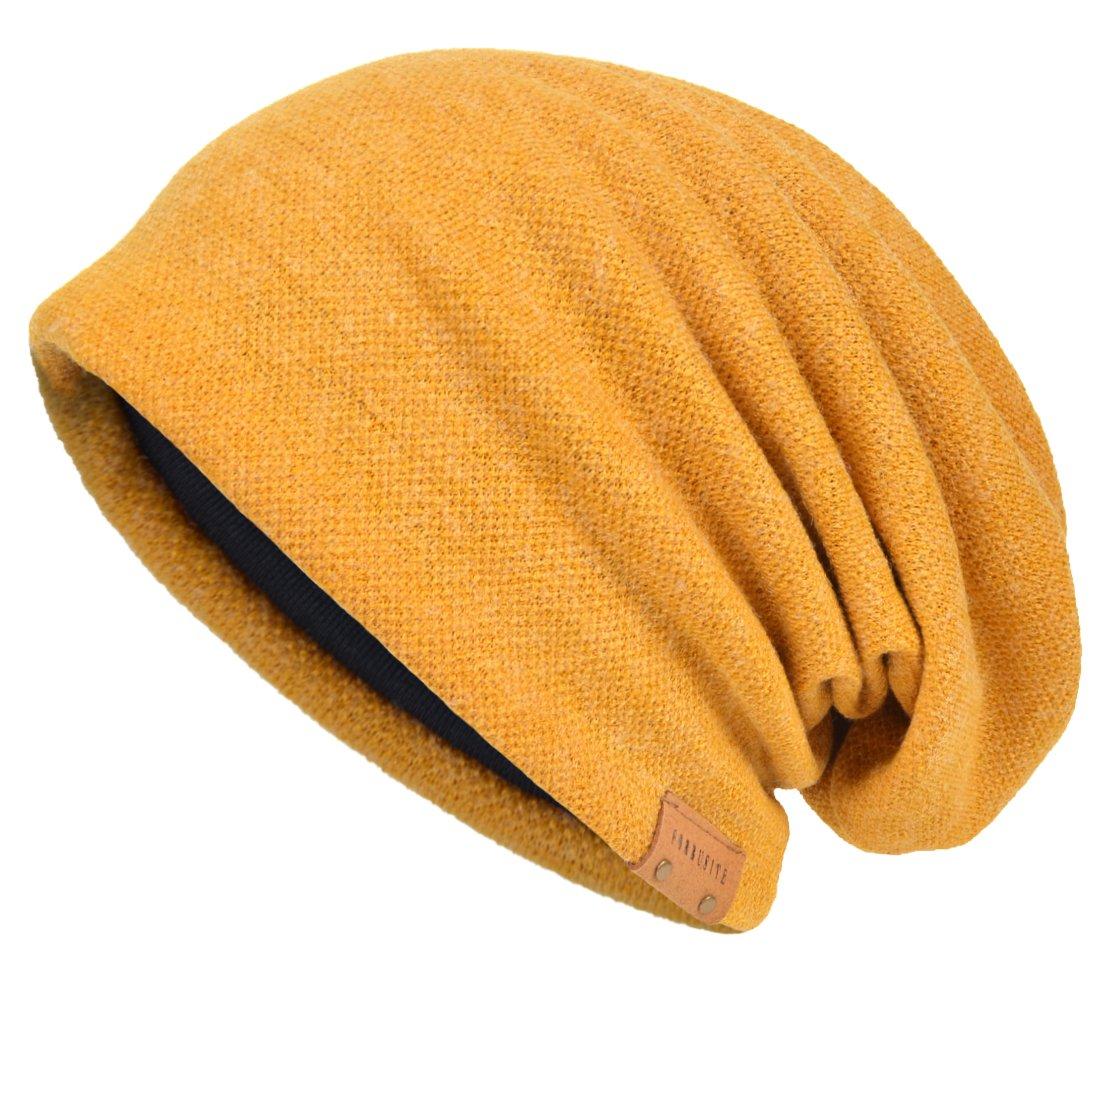 VECRY Men's Cool Cotton Beanie Slouch Skull Cap Long Baggy Hip-hop Winter Summer Hat (Ginger)